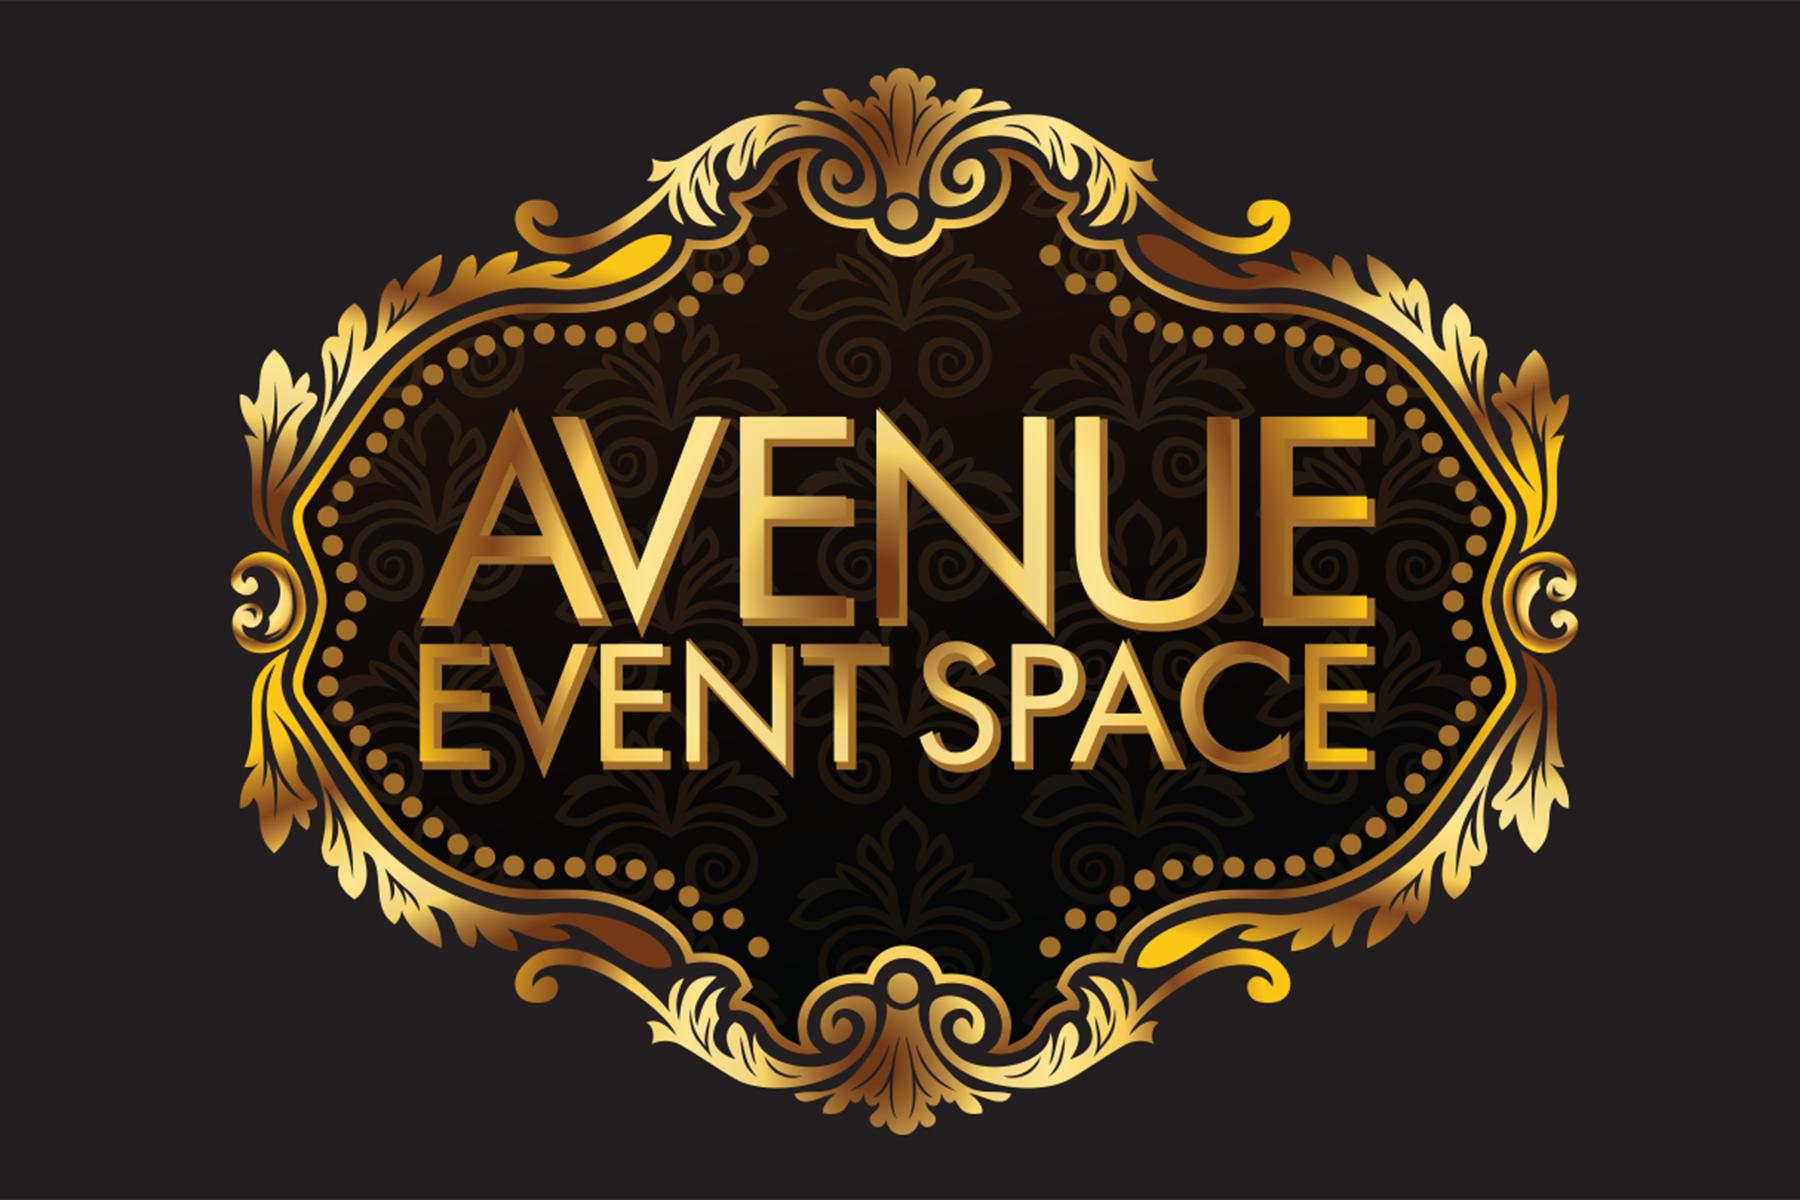 Avenue Event Space